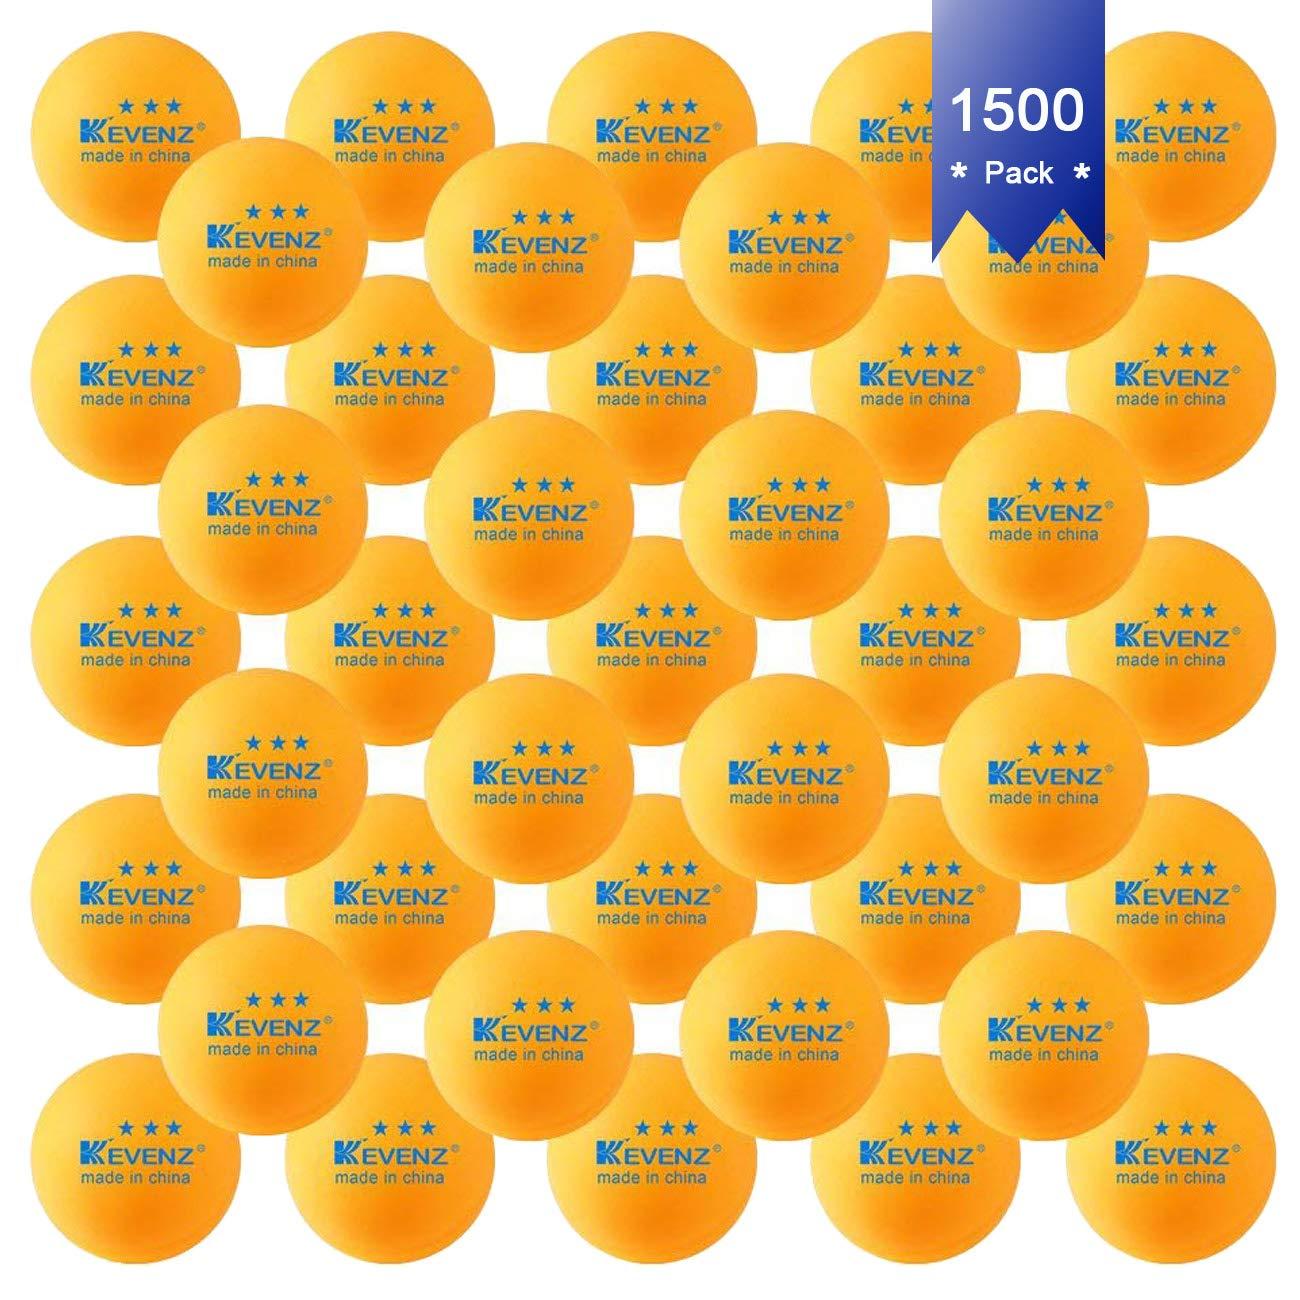 KEVENZ 1500-Pack 3-Star 40+ Orange Table Tennis Balls Wholesale,Advanced Training Ping Pong Balls Bulk Sale (Orange)